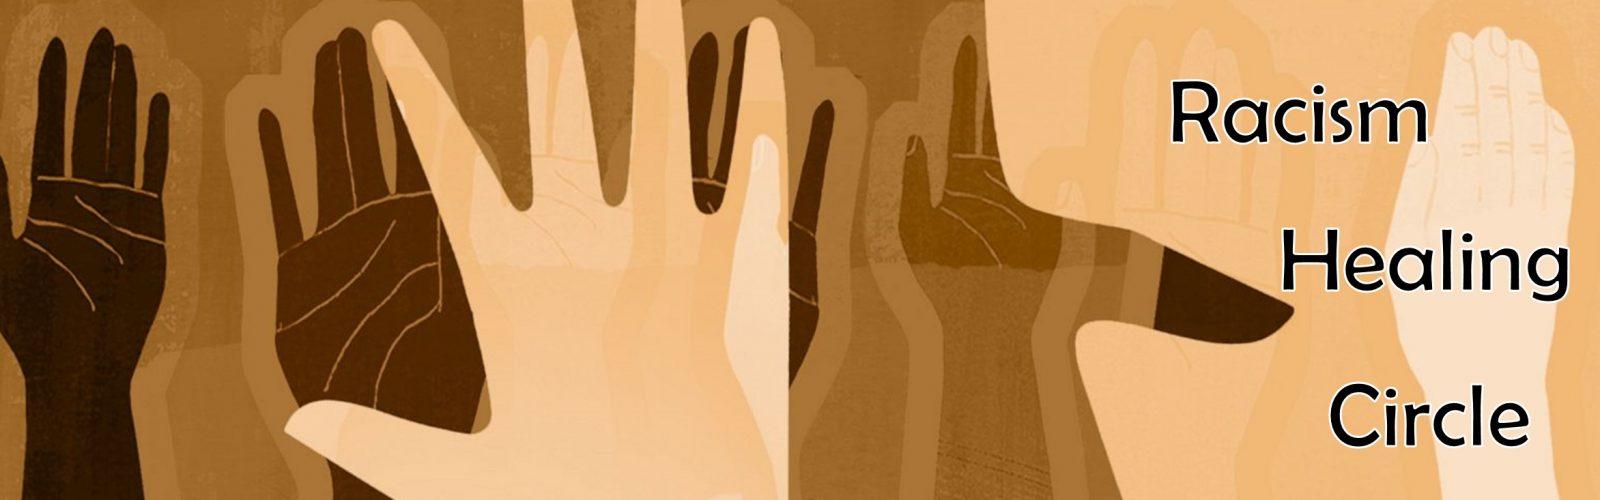 Racism Healing Circle Banner-Slider - Multiple Hands (June 2021)